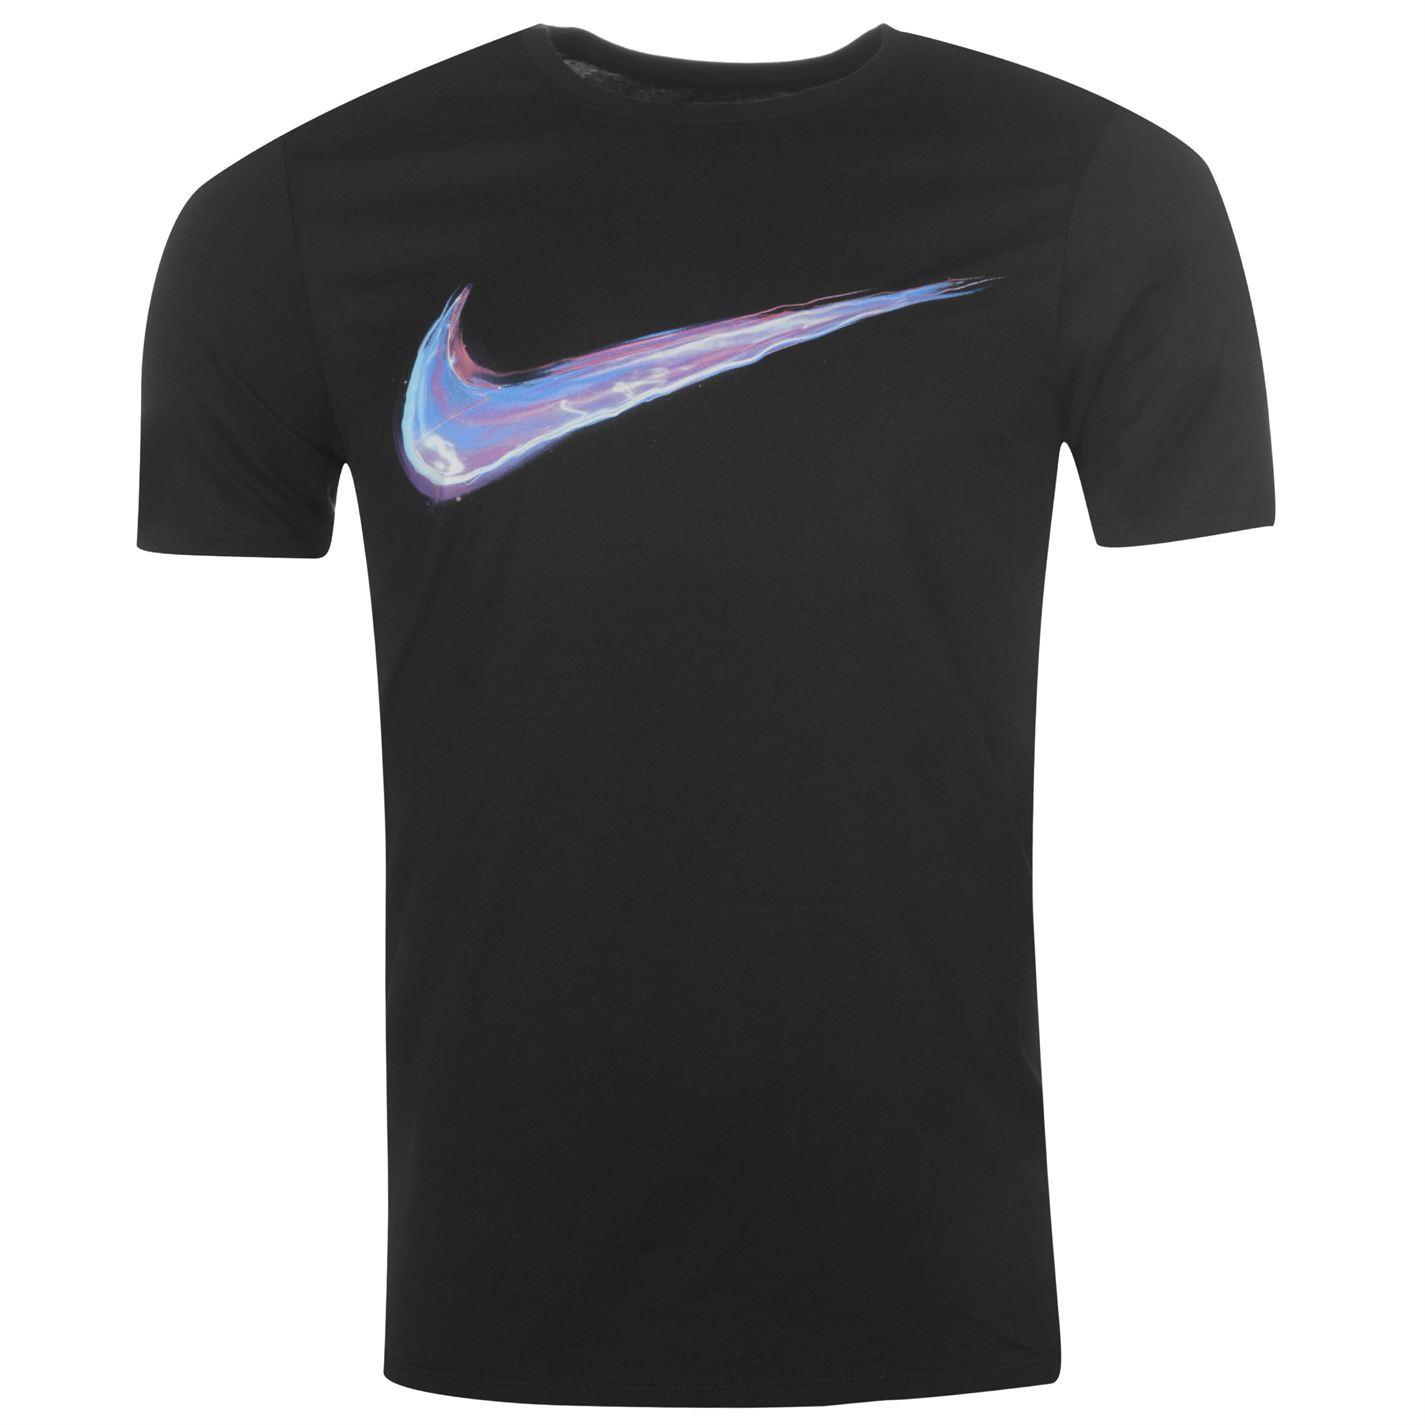 ff1f4af01815 Nike Streak Swoosh QTT T-Shirt Mens Tee Shirt Top